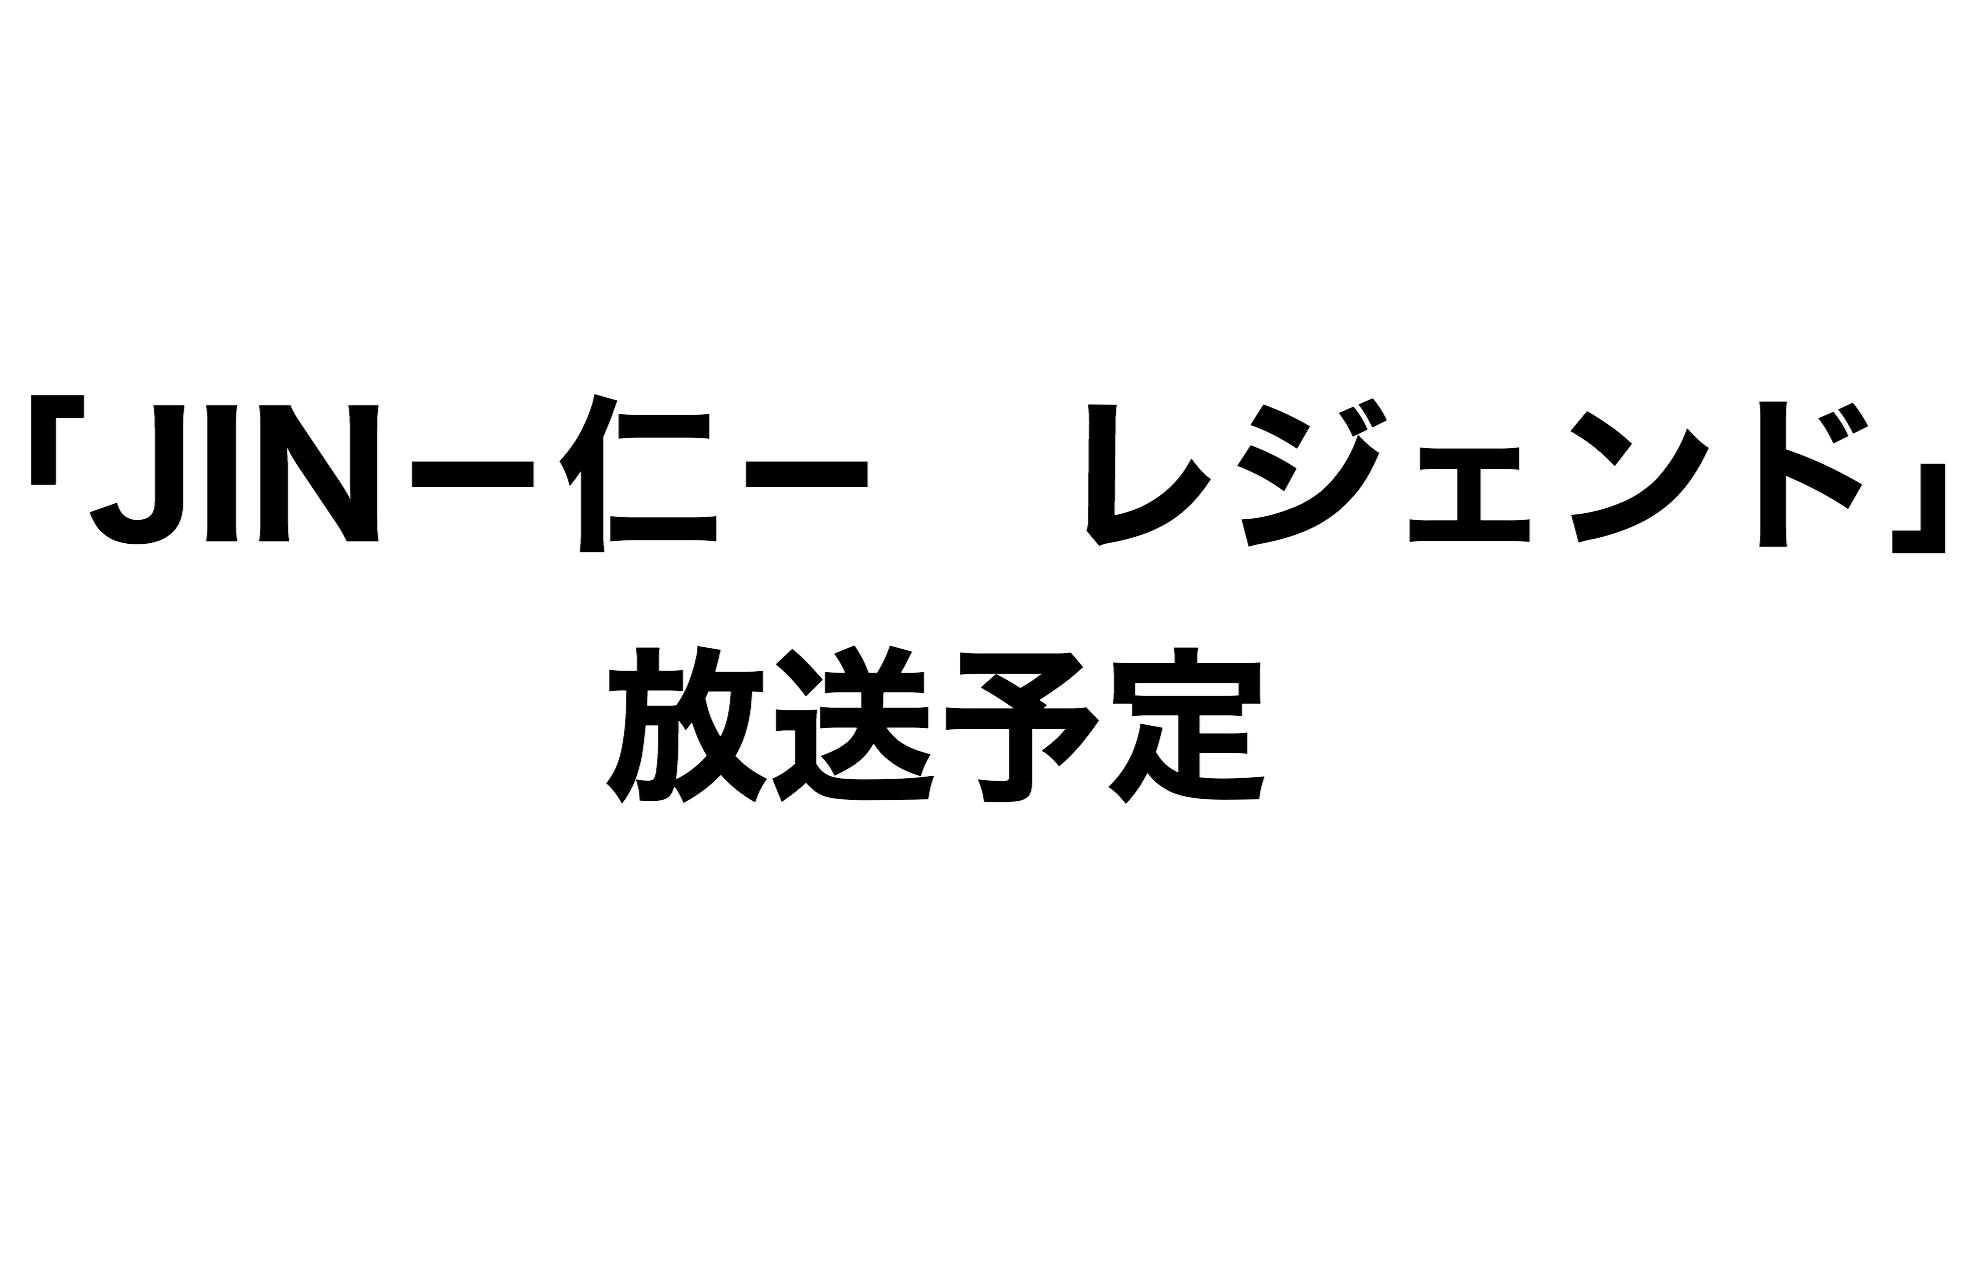 「JIN-仁- レジェンド」各地方の放送予定